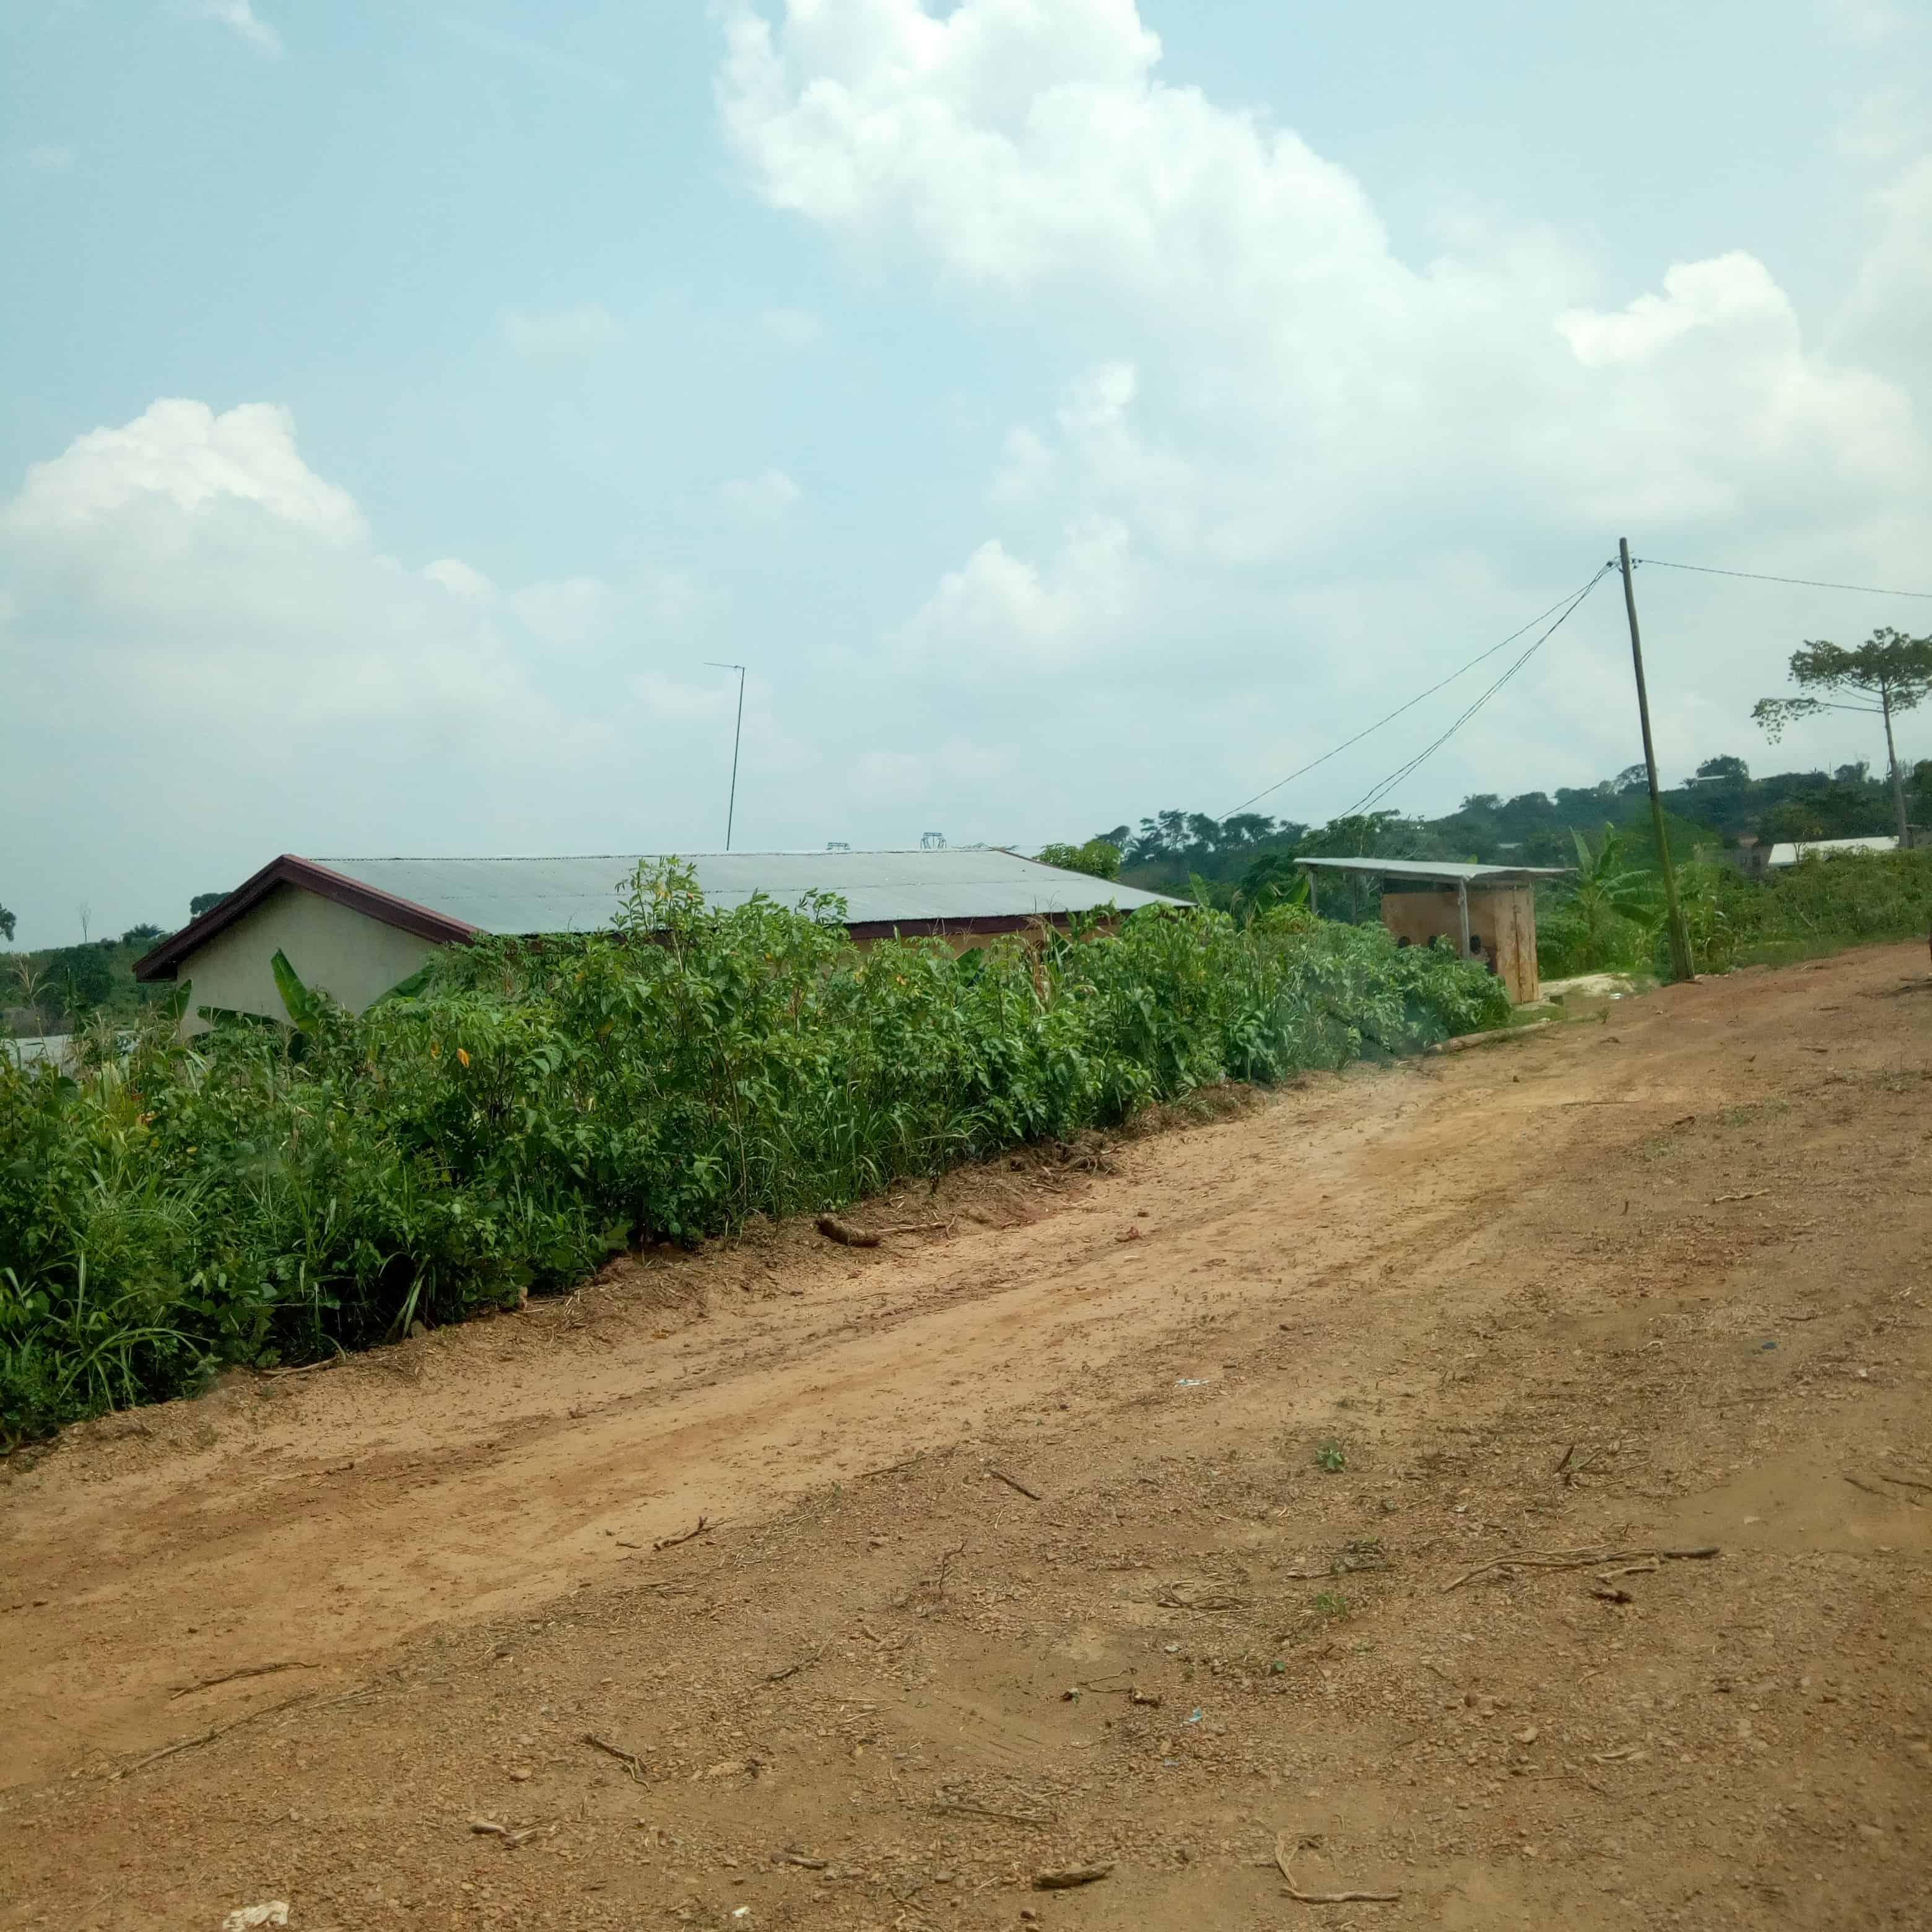 Land for sale at Douala, Bassa, dibamba - 1000 m2 - 3 500 000 FCFA